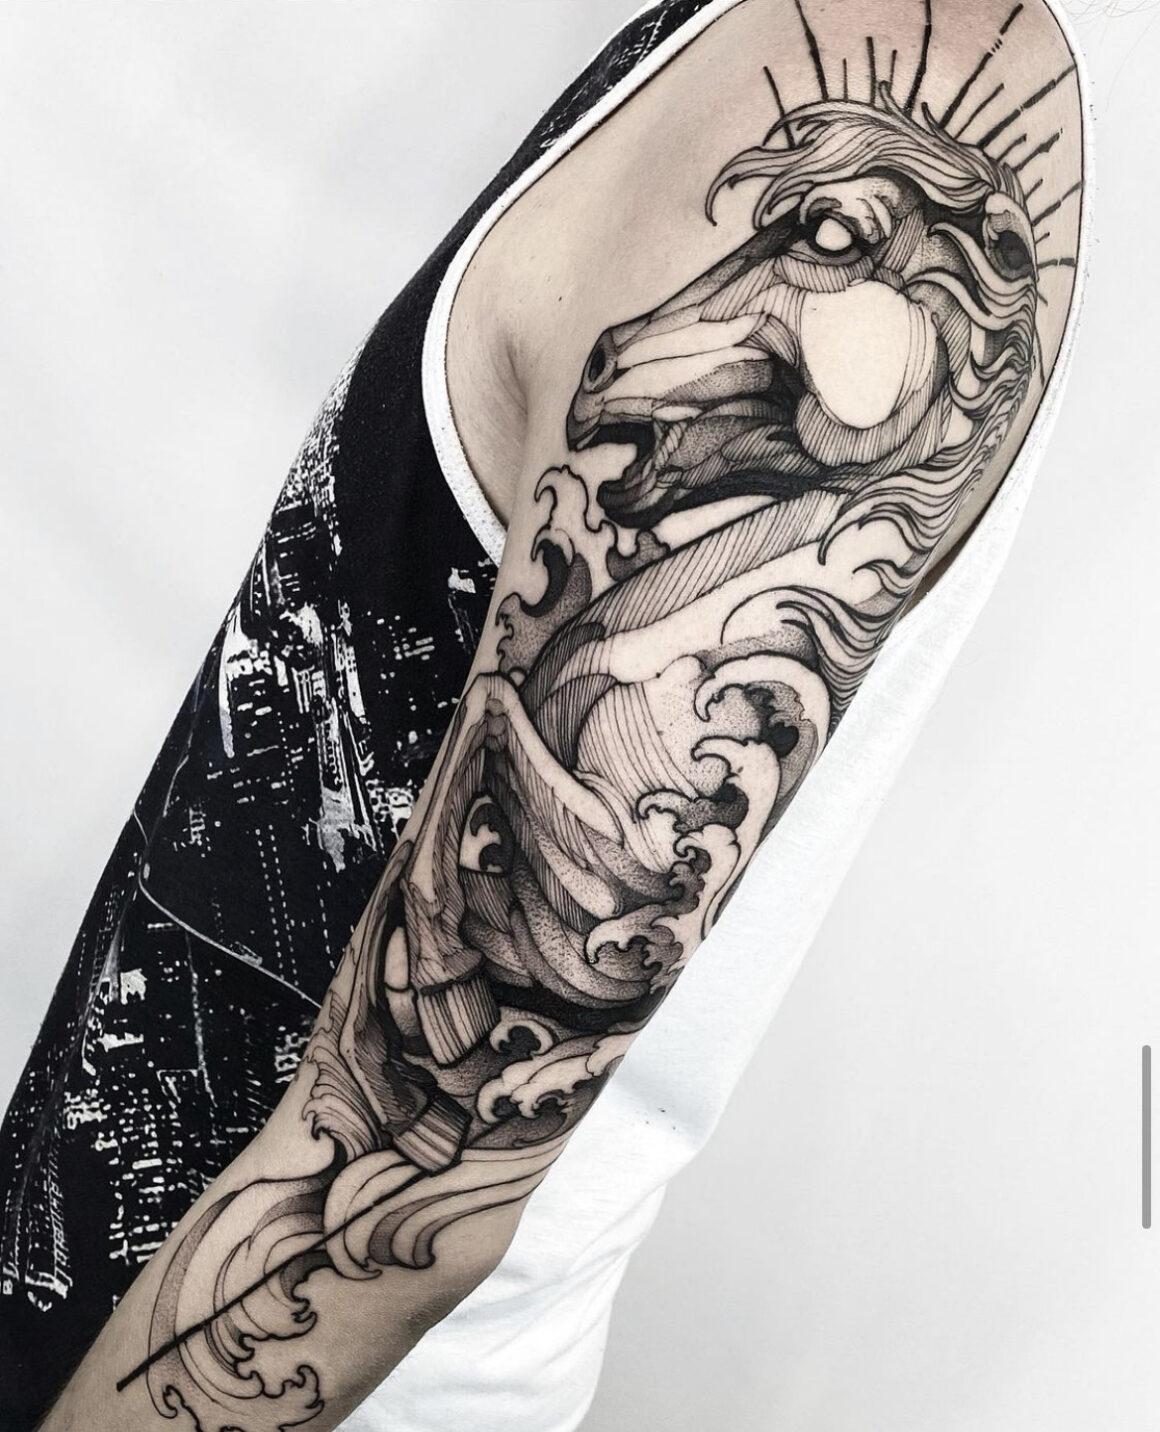 Fredao Oliveira, Inkonik Tattoo Studio, Belo Horizonte, Brazil